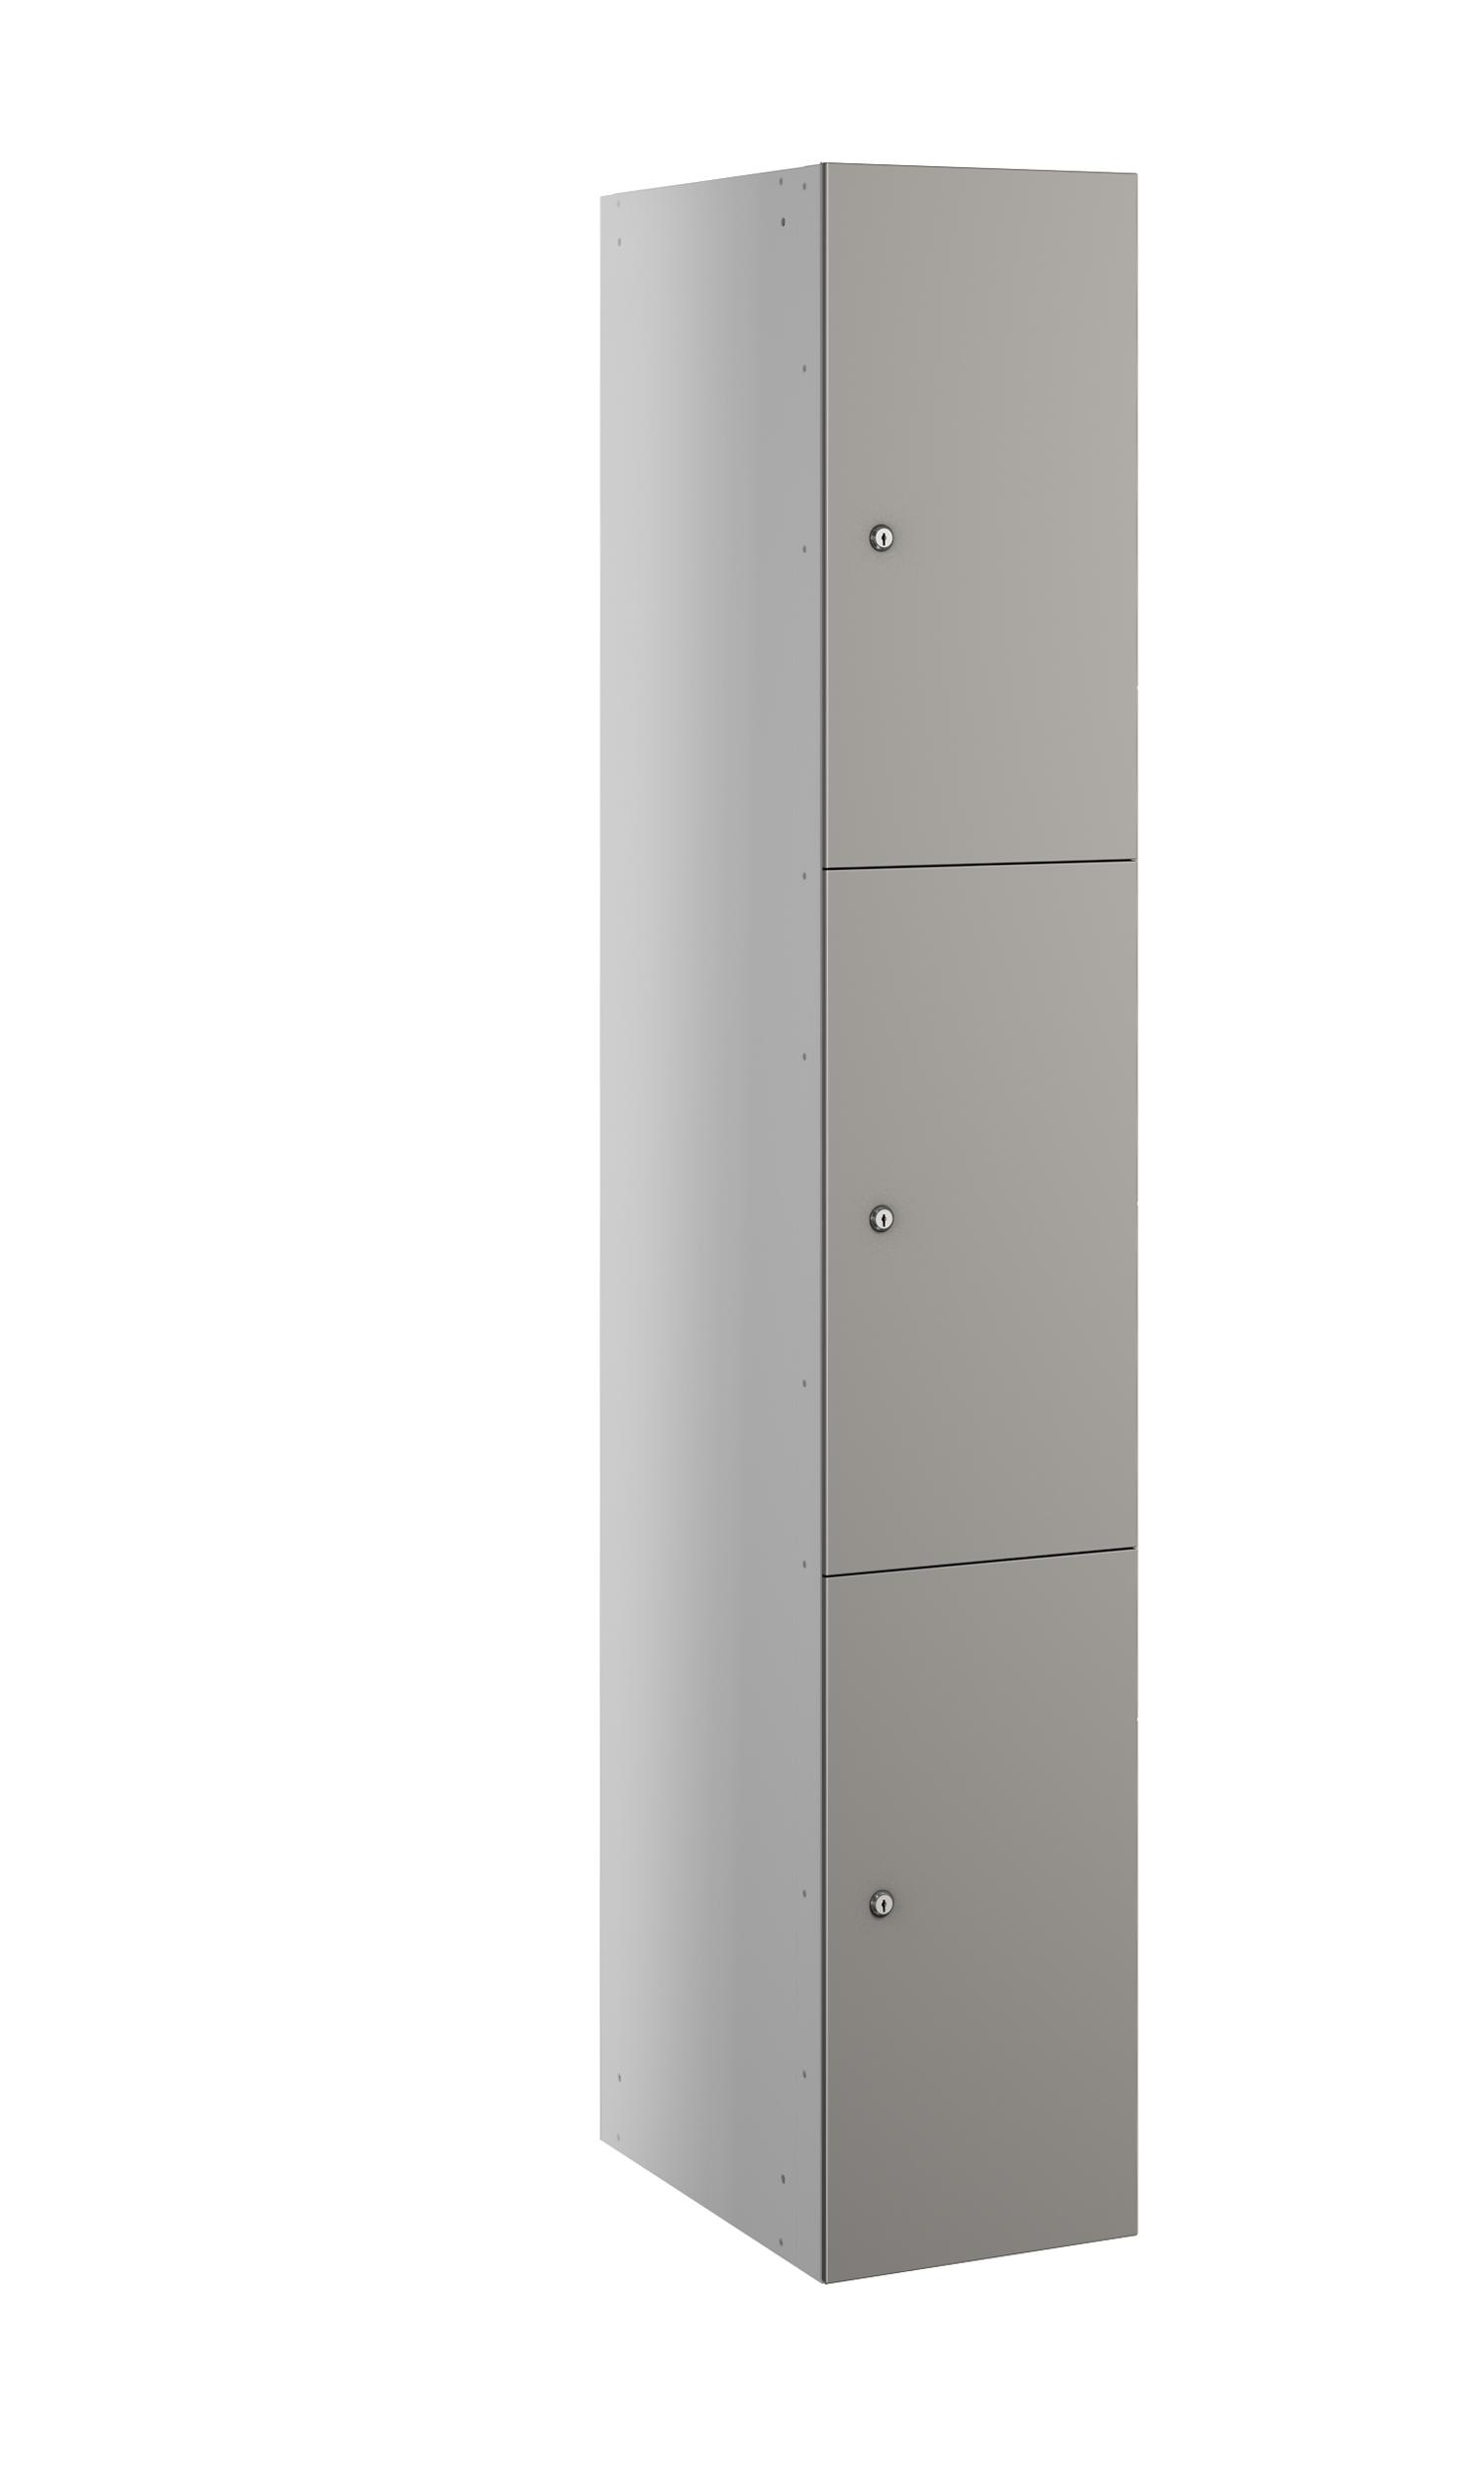 Probe buzzbox laminate 3 door grey